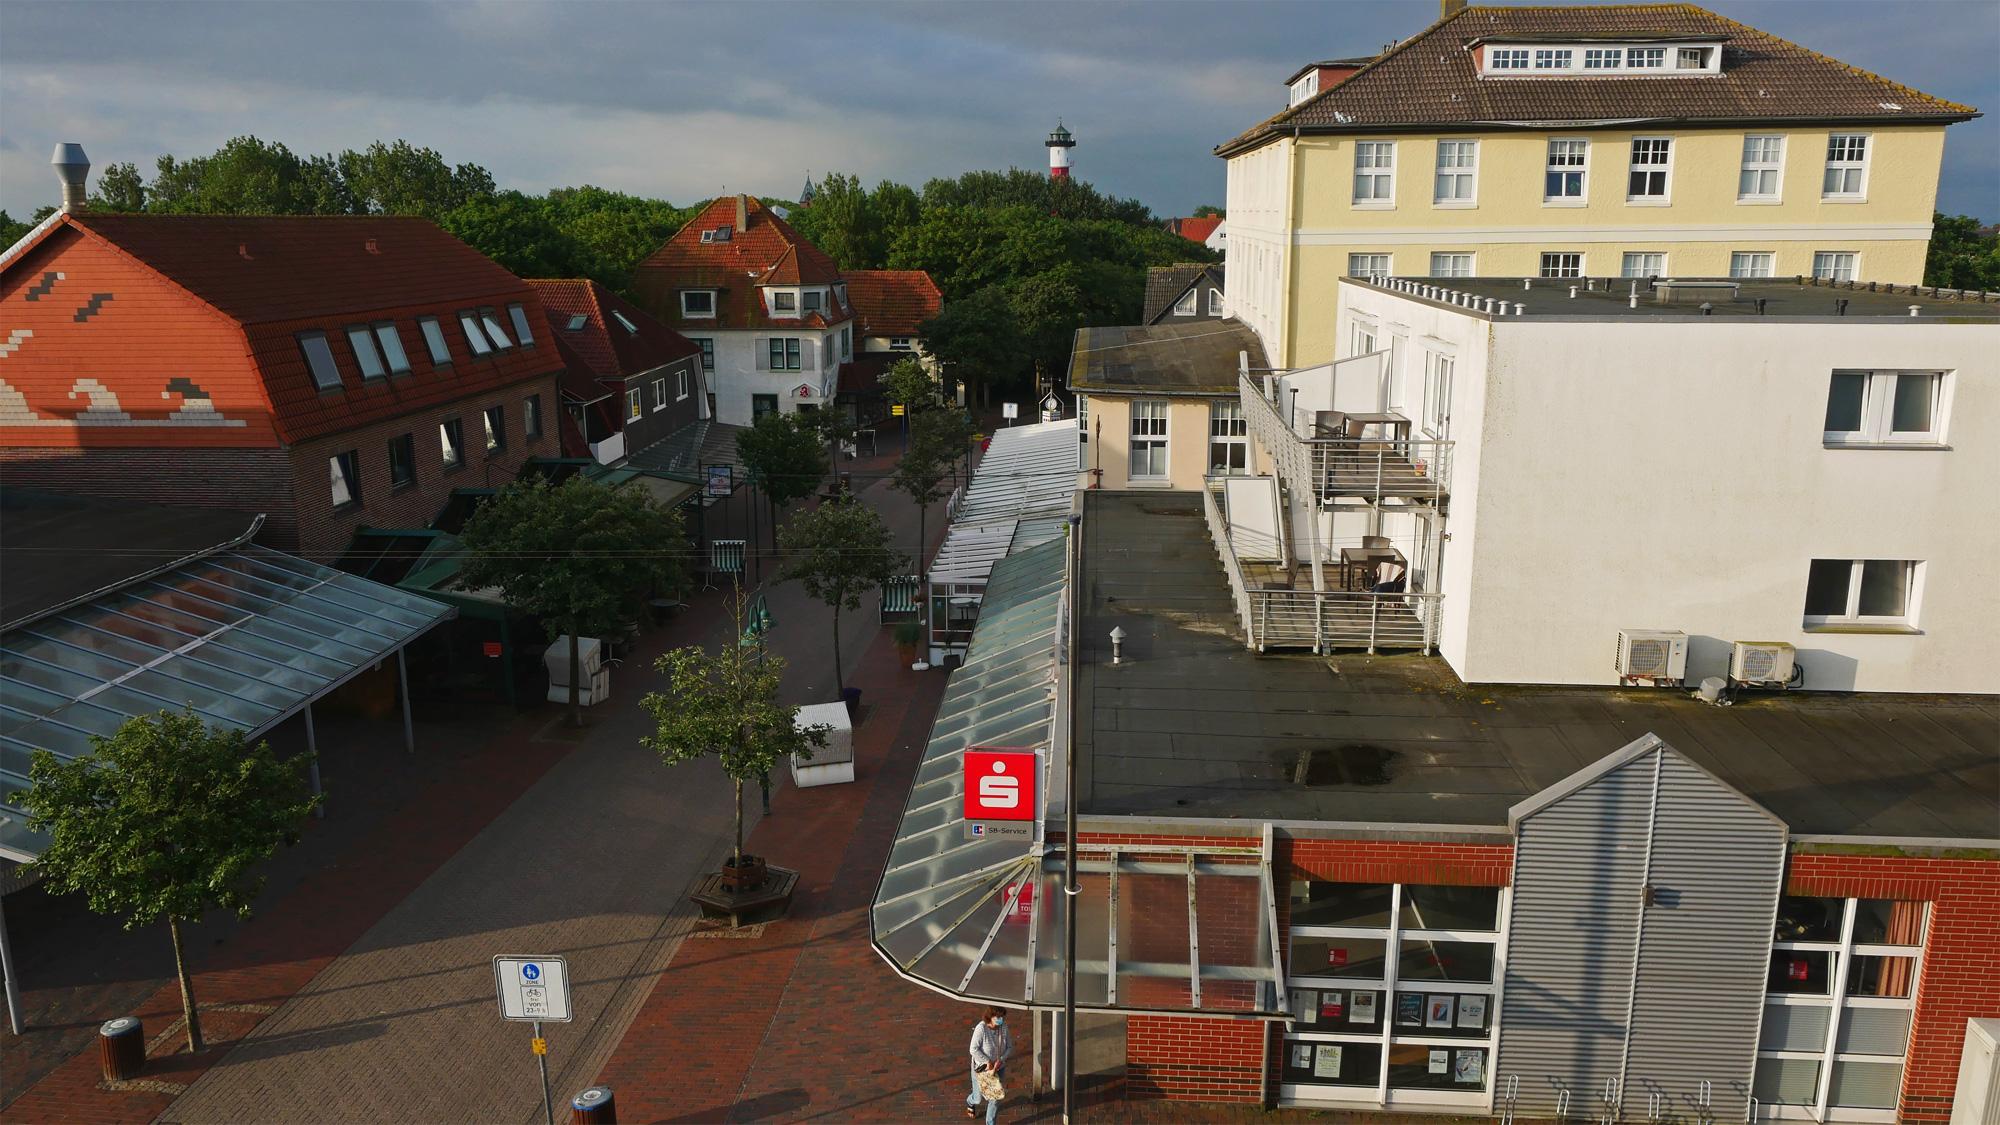 Wangerooge: Der Leuchtturm wacht über den Ort